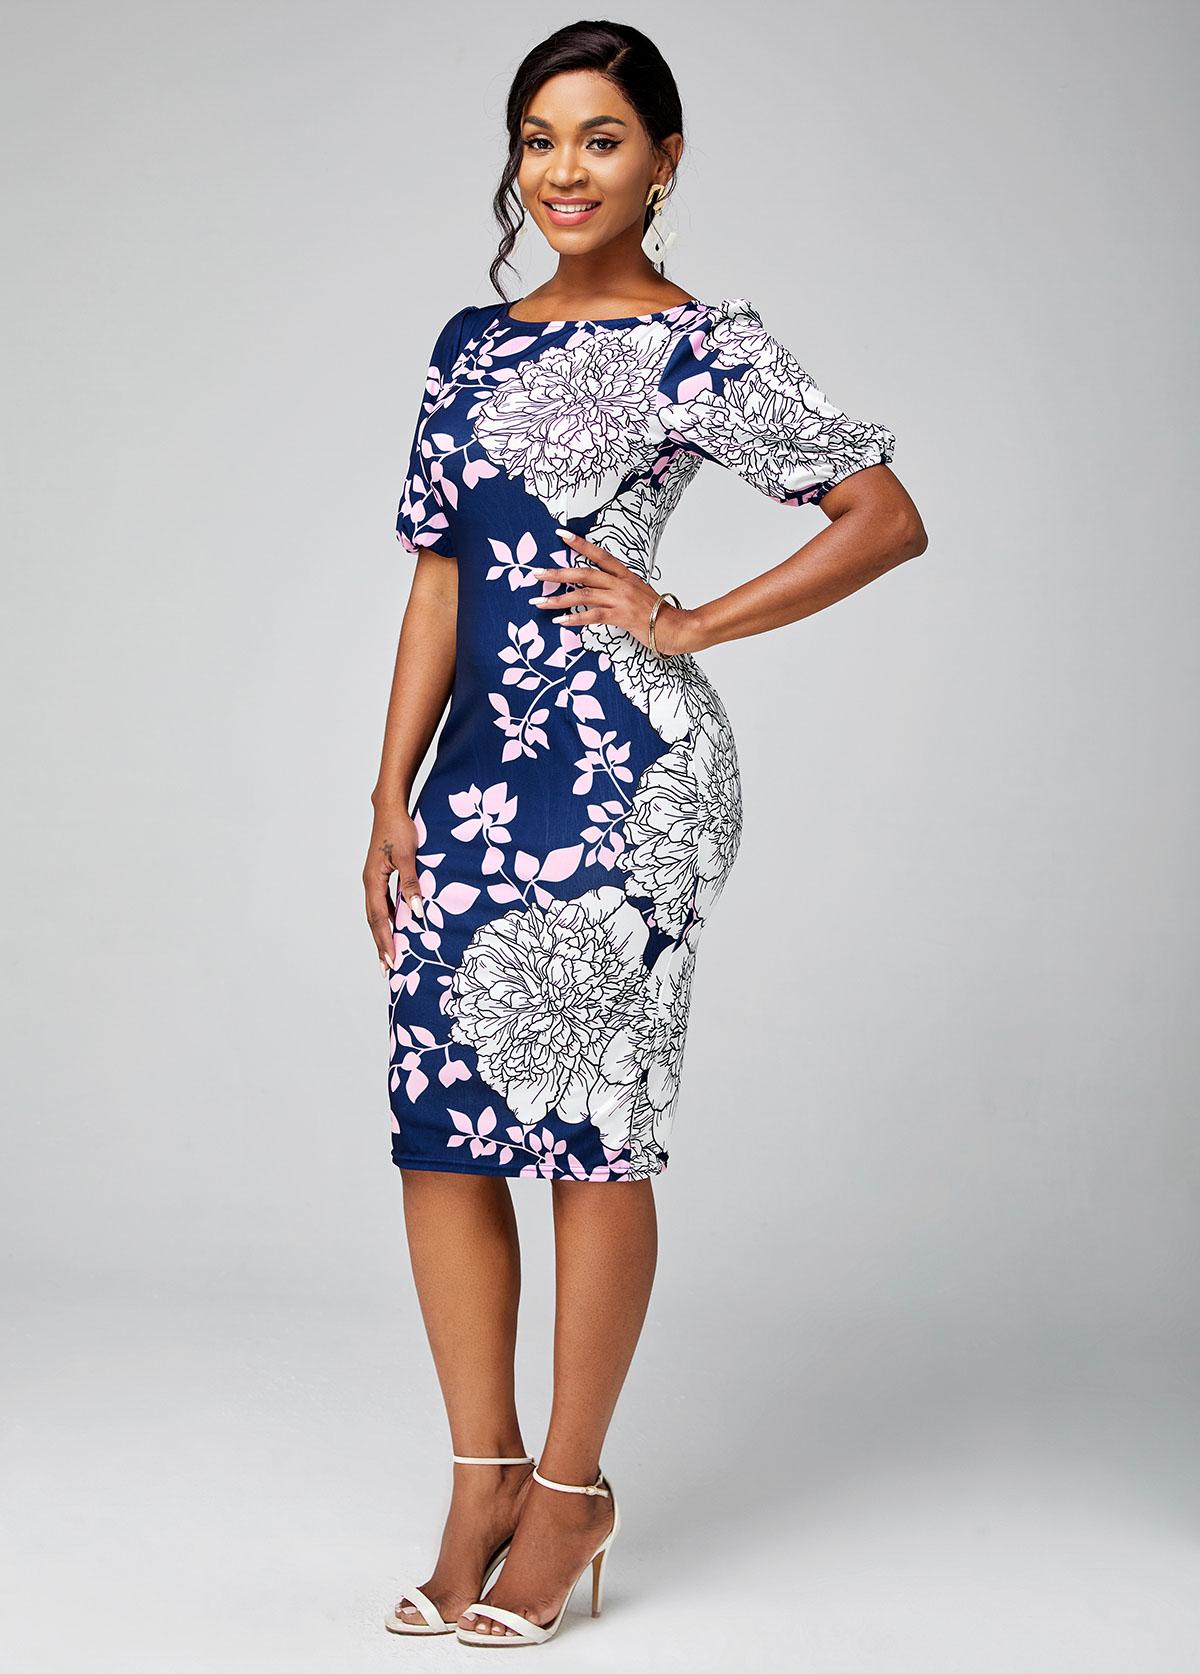 Short Sleeve Floral Print Round Neck Bodycon Dress